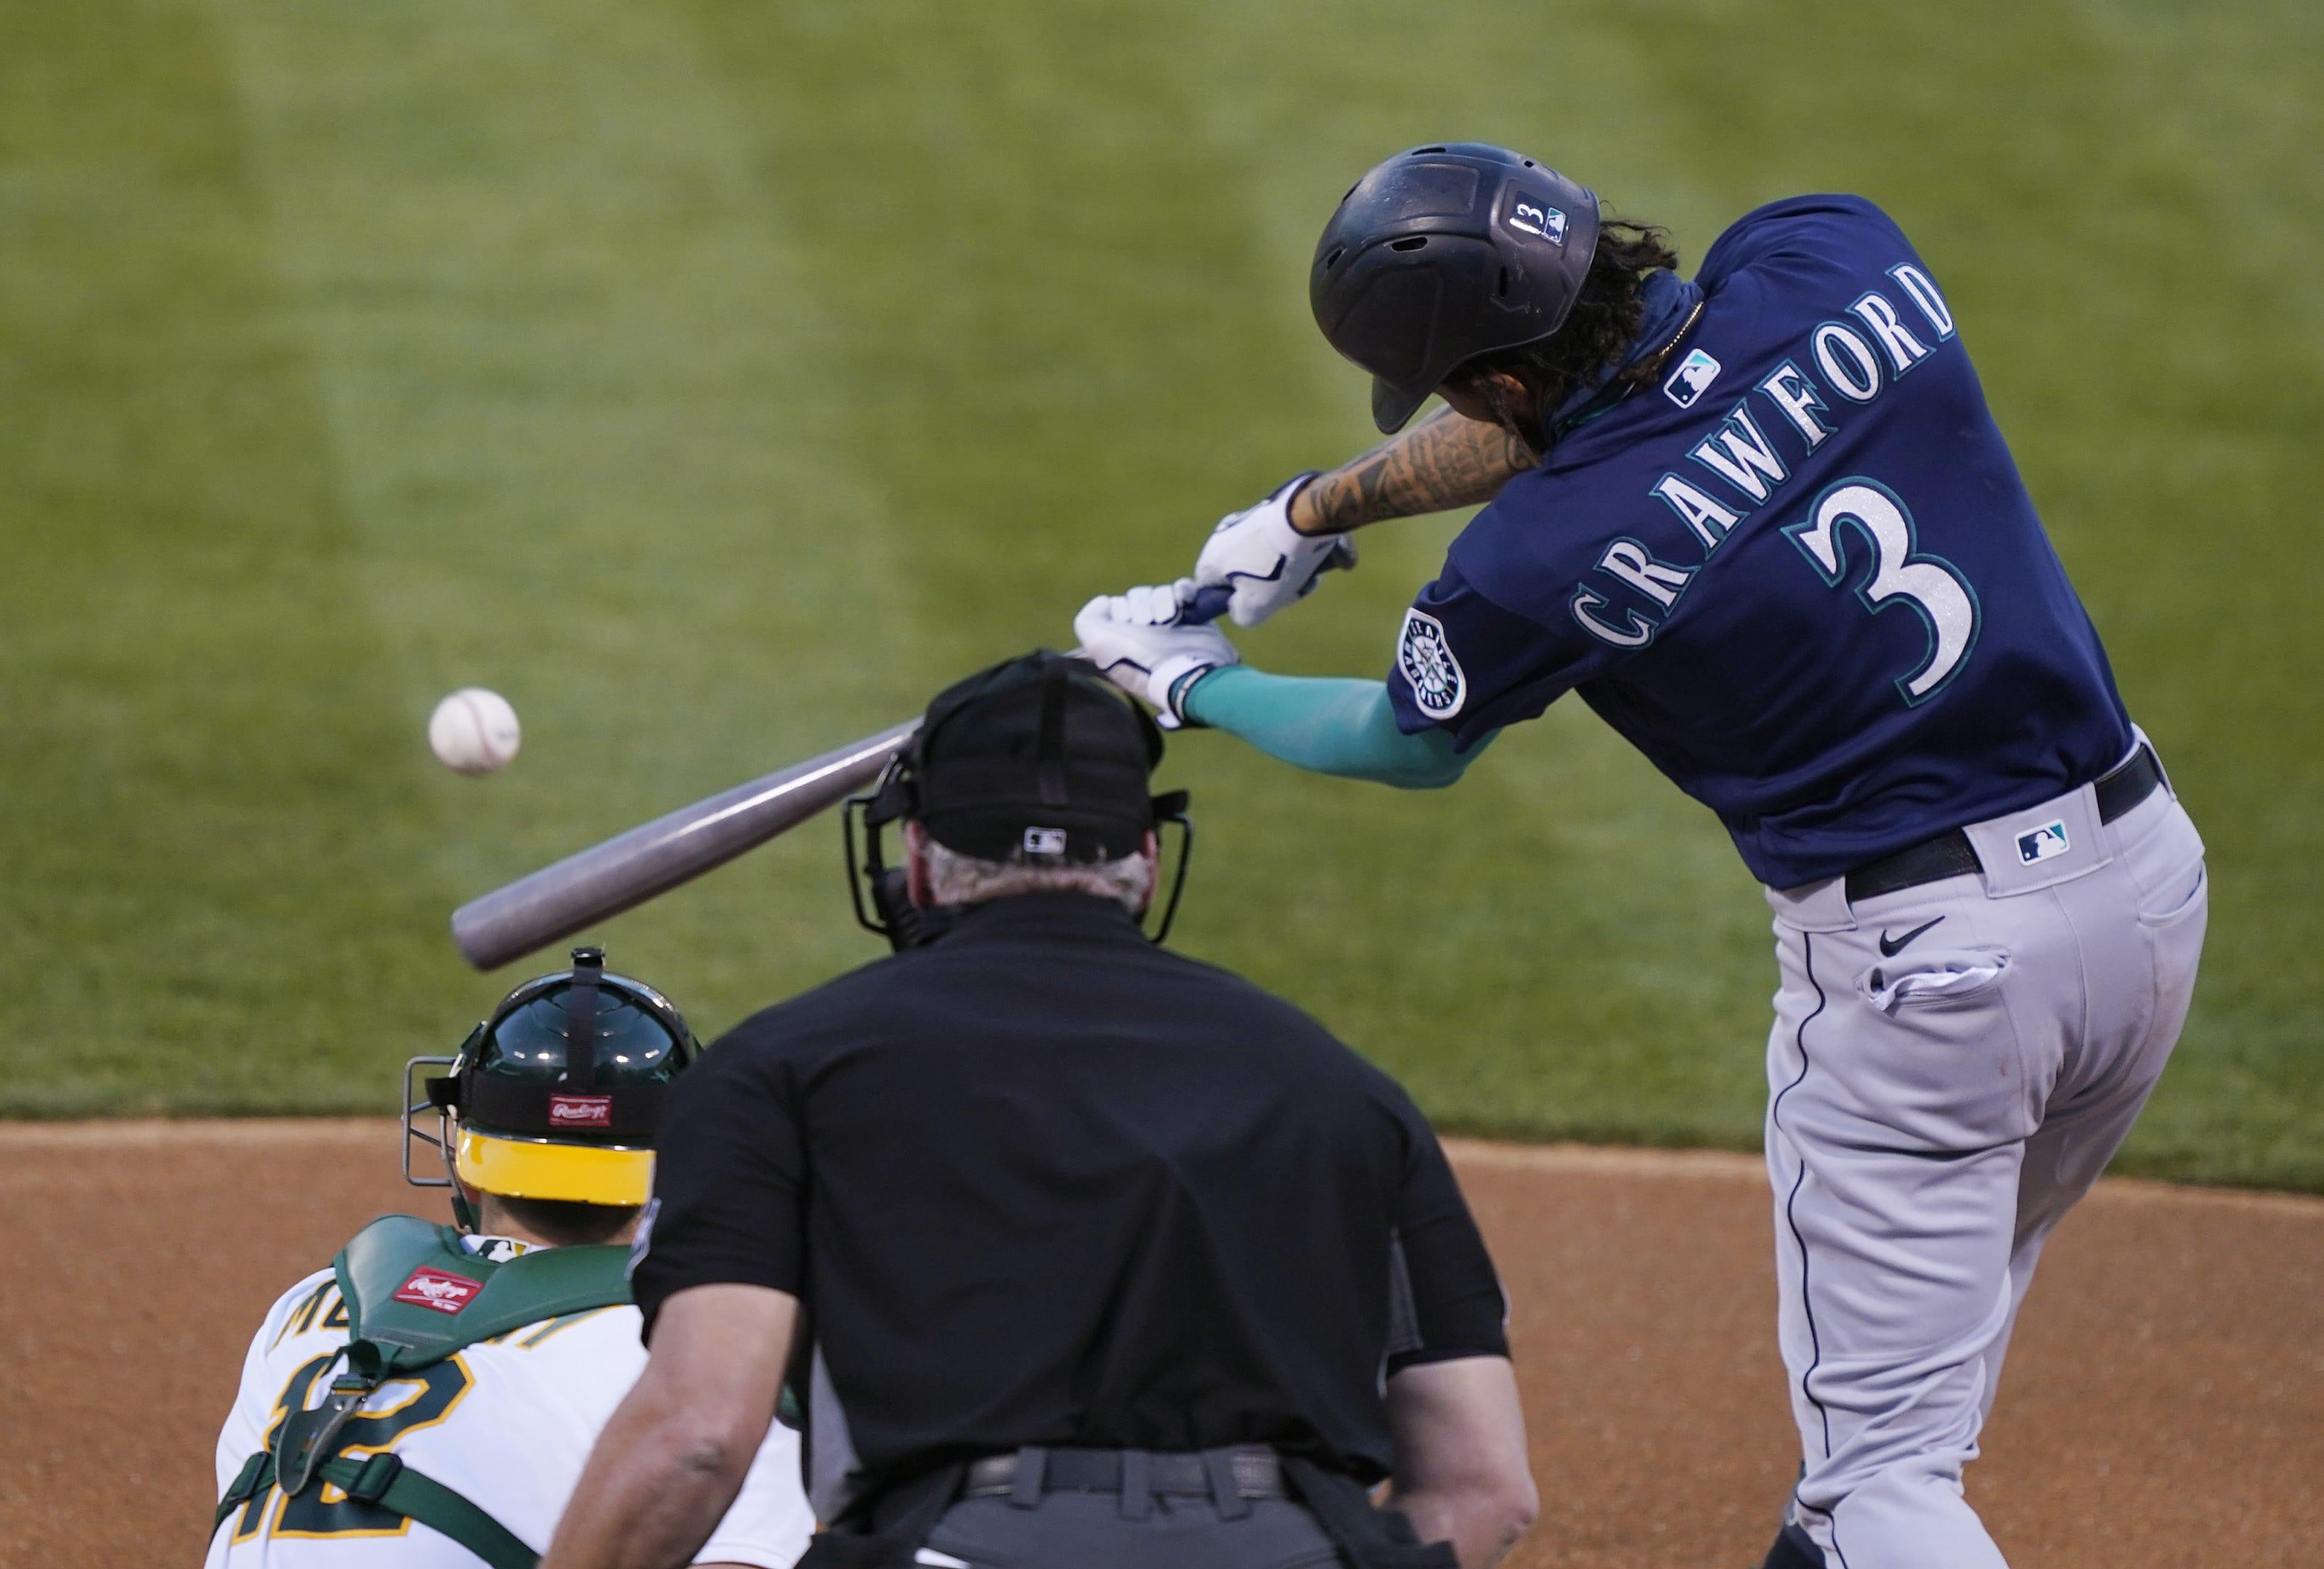 J.P. Crawford hits the ball.